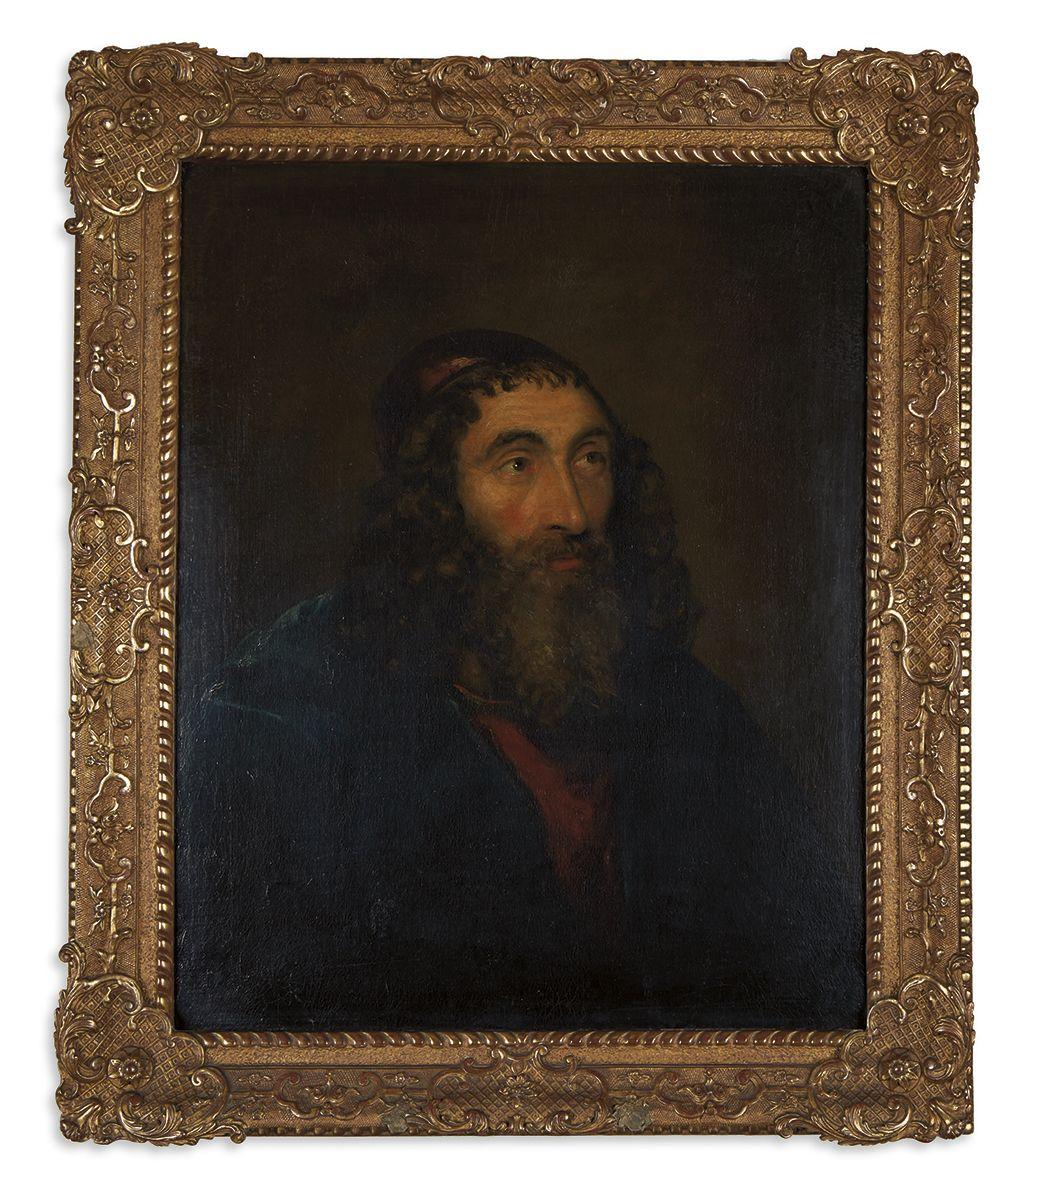 Half-length portrait of a Bearded Rabbi.